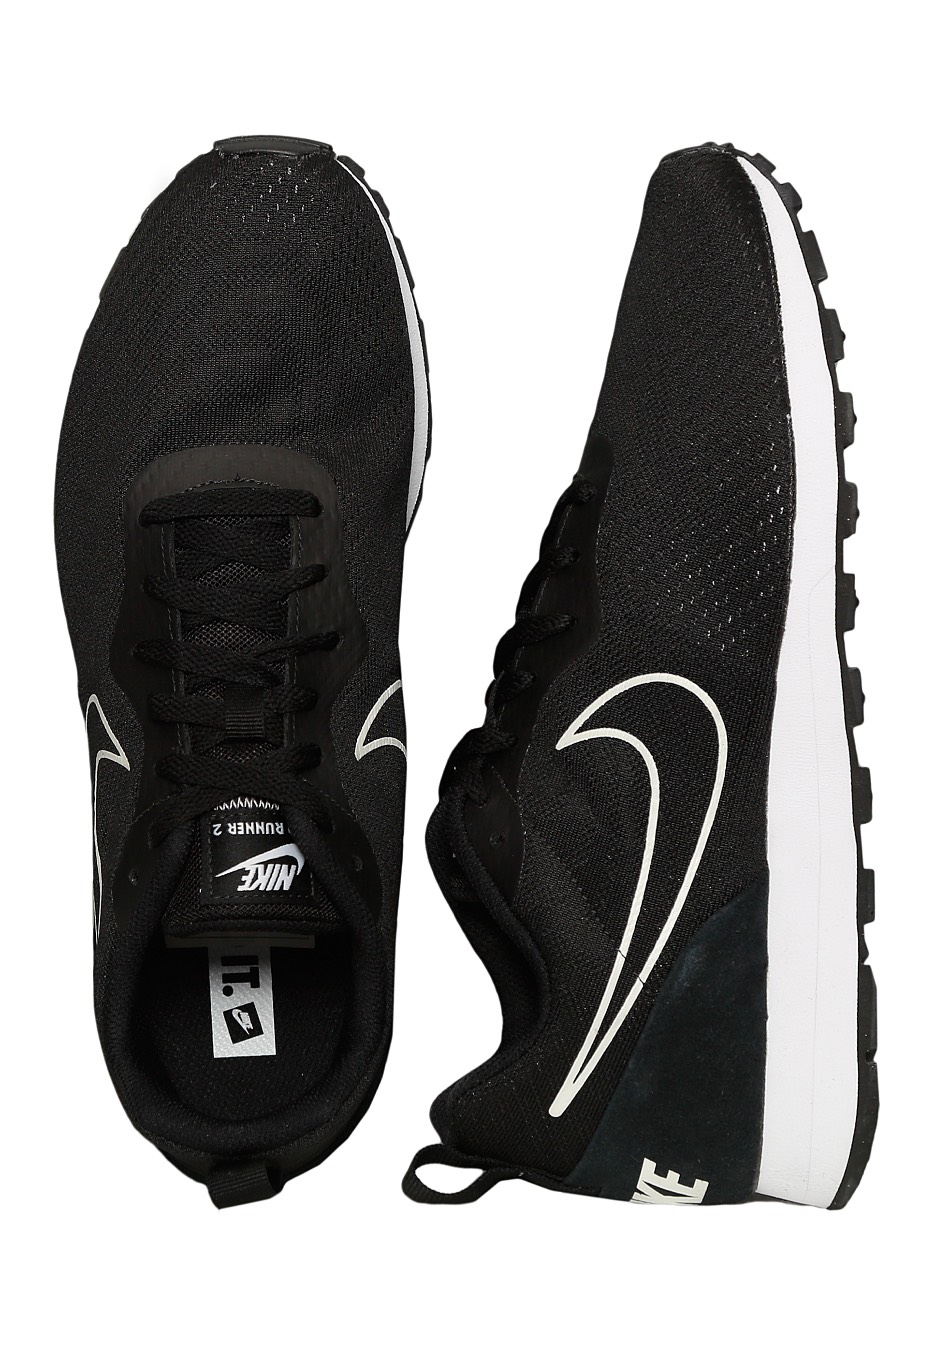 180c691cfbf5 Nike - MD Runner 2 Mesh Black Black - Shoes - Impericon.com UK